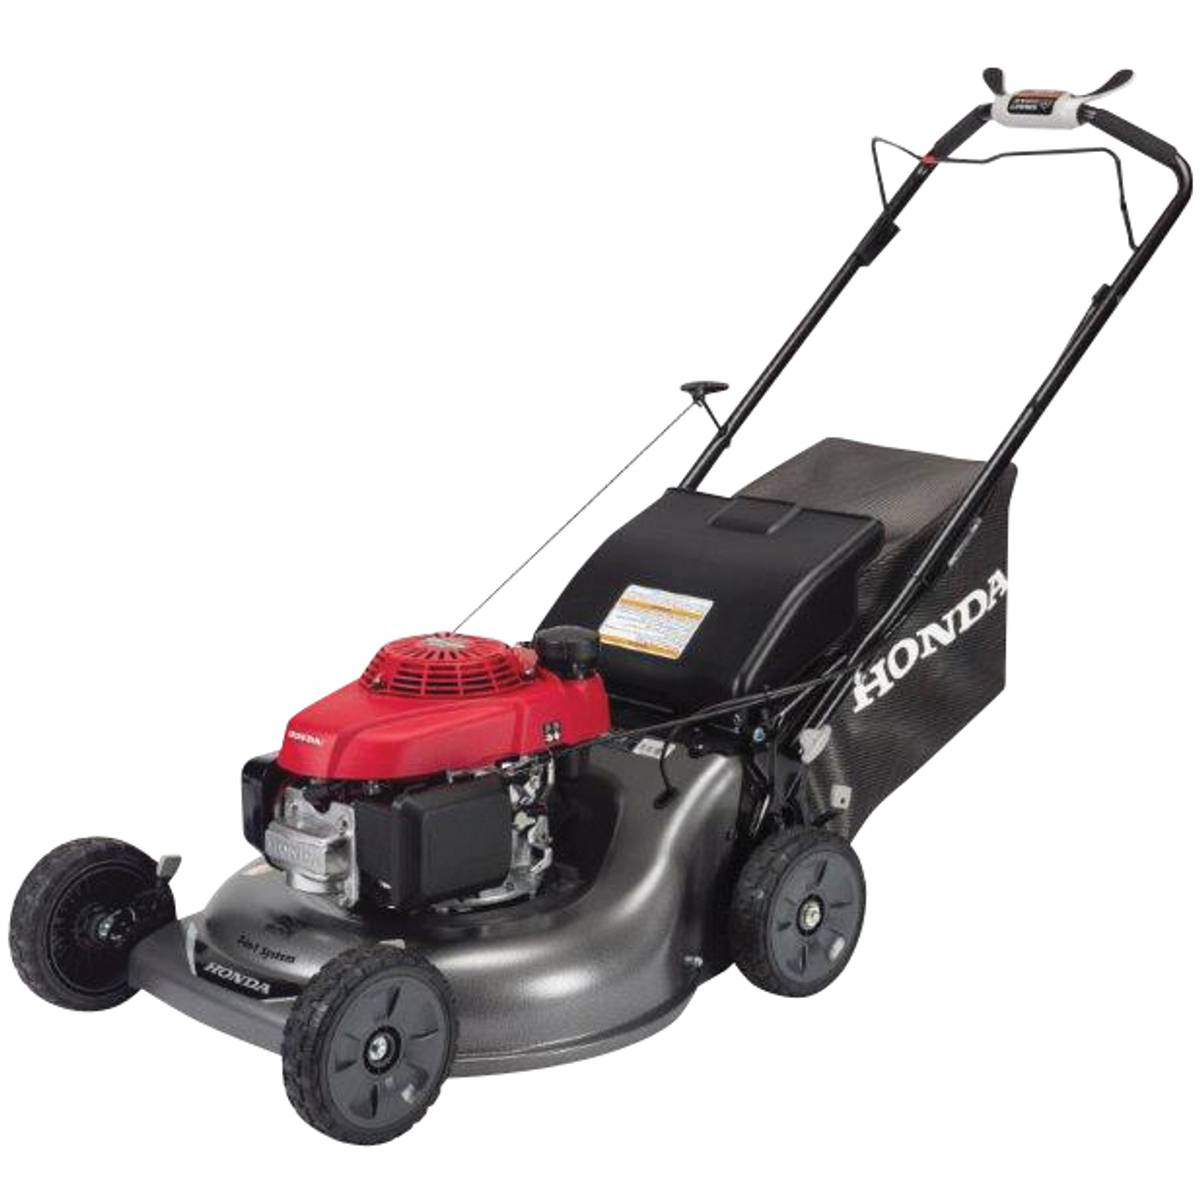 Honda Power Equipment Self-Propelled Recoil Start Lawn Mower